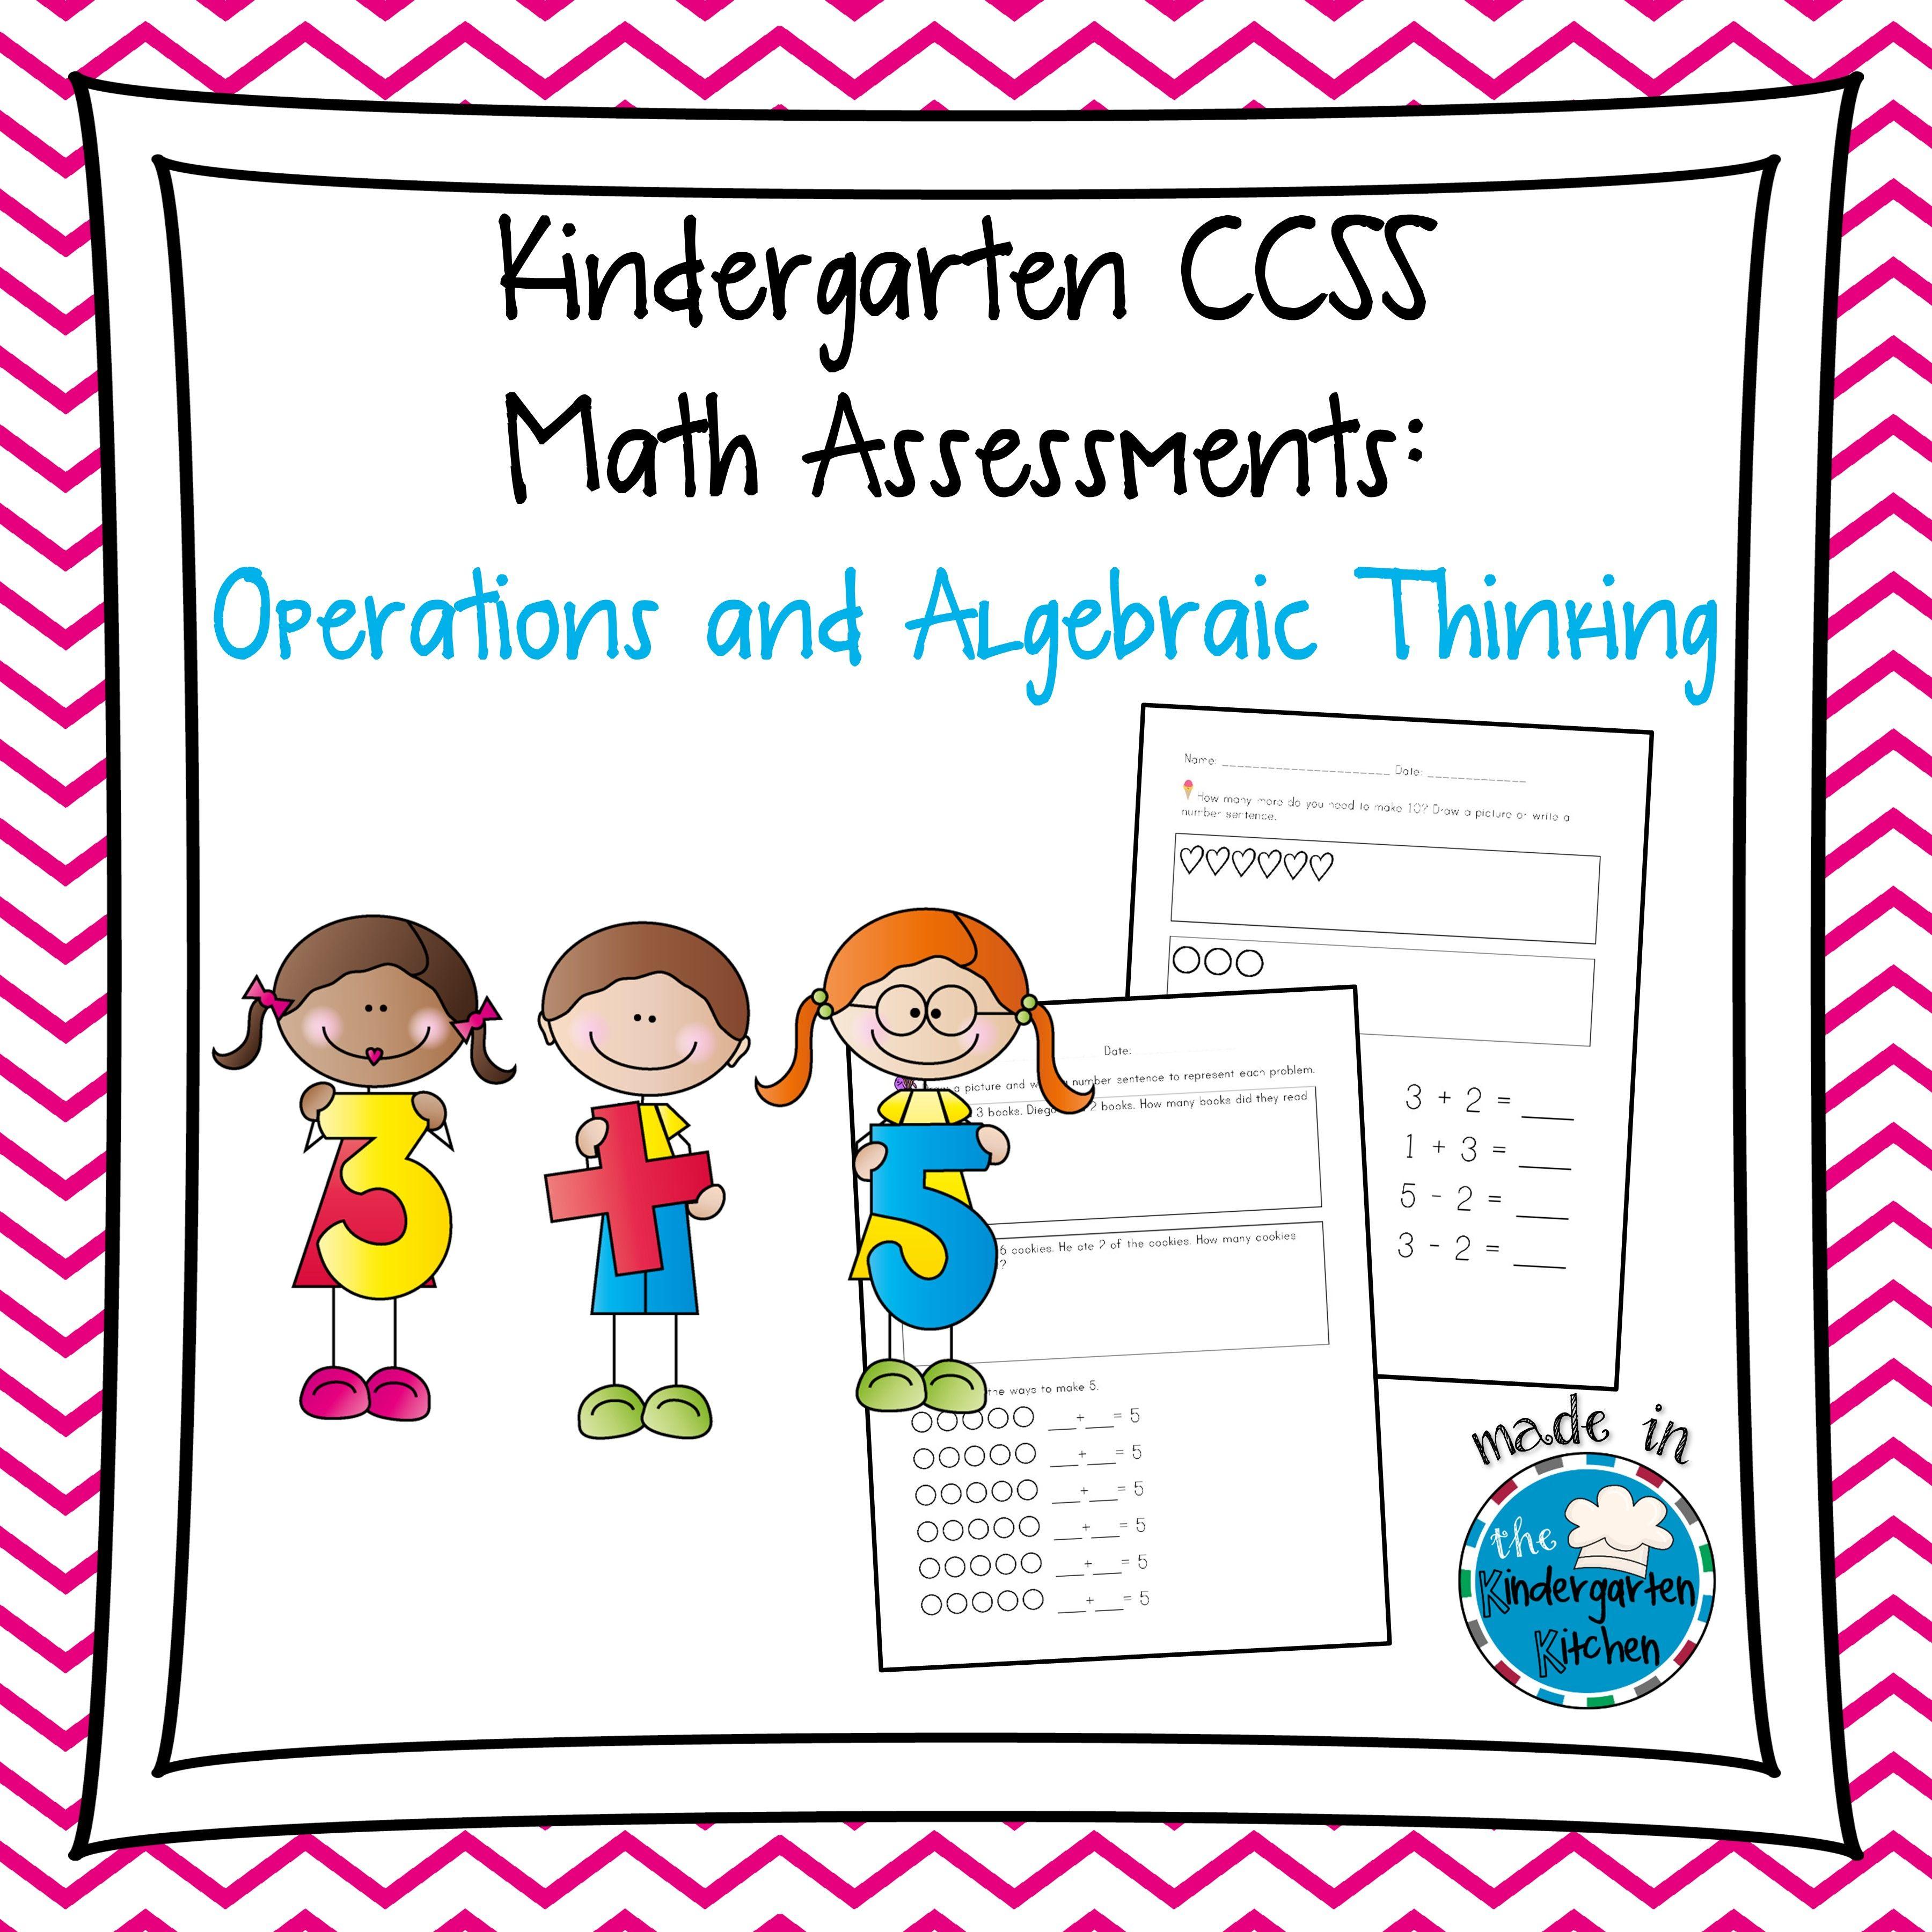 Kindergarten Ccss Math Assessments Operations And